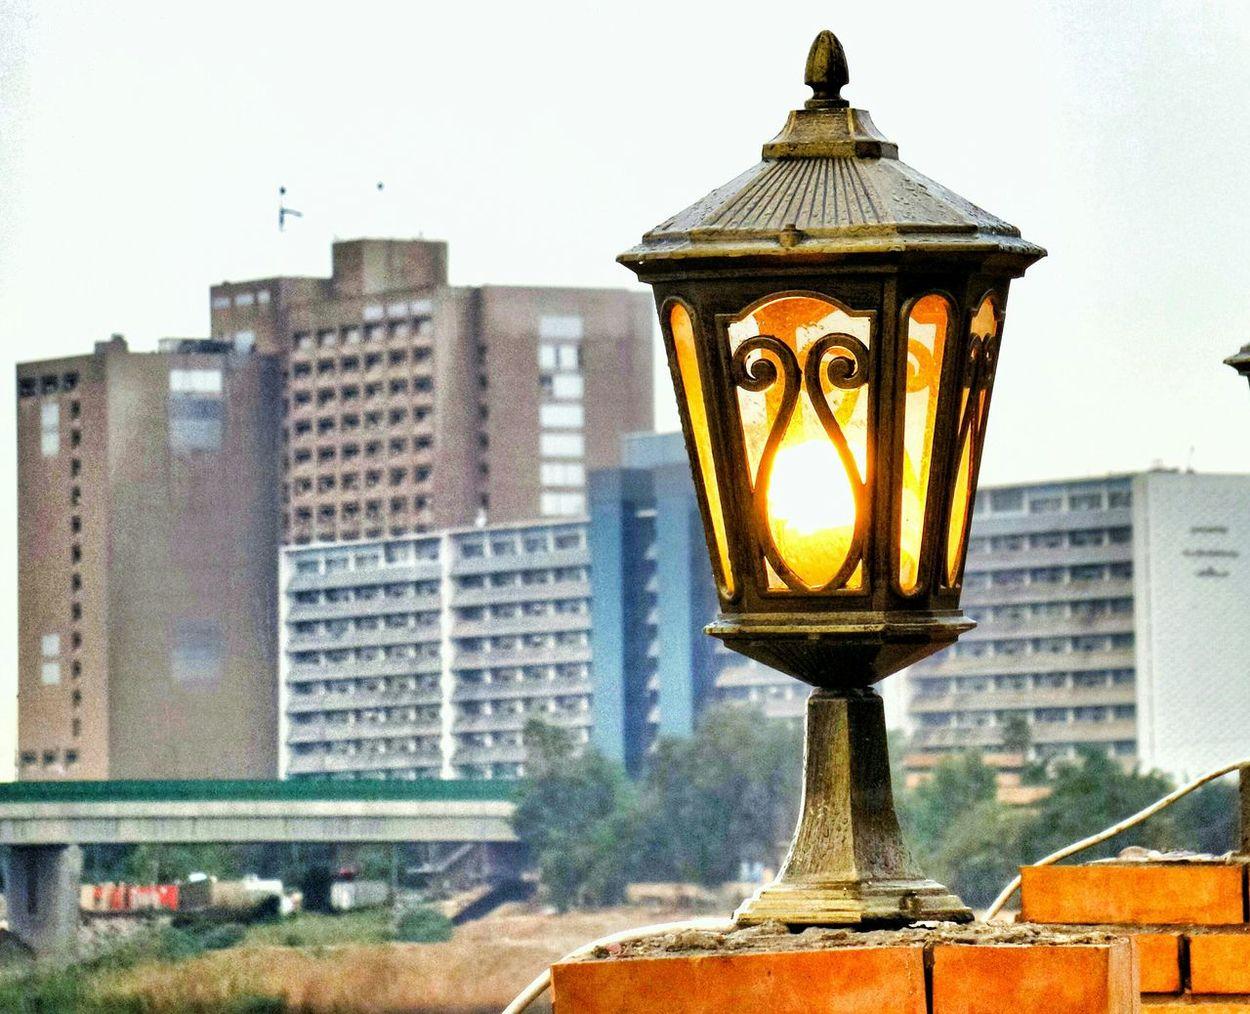 Iraq . Baghdad Medical City Hospital Alqushla Almutanabi Light Lamp